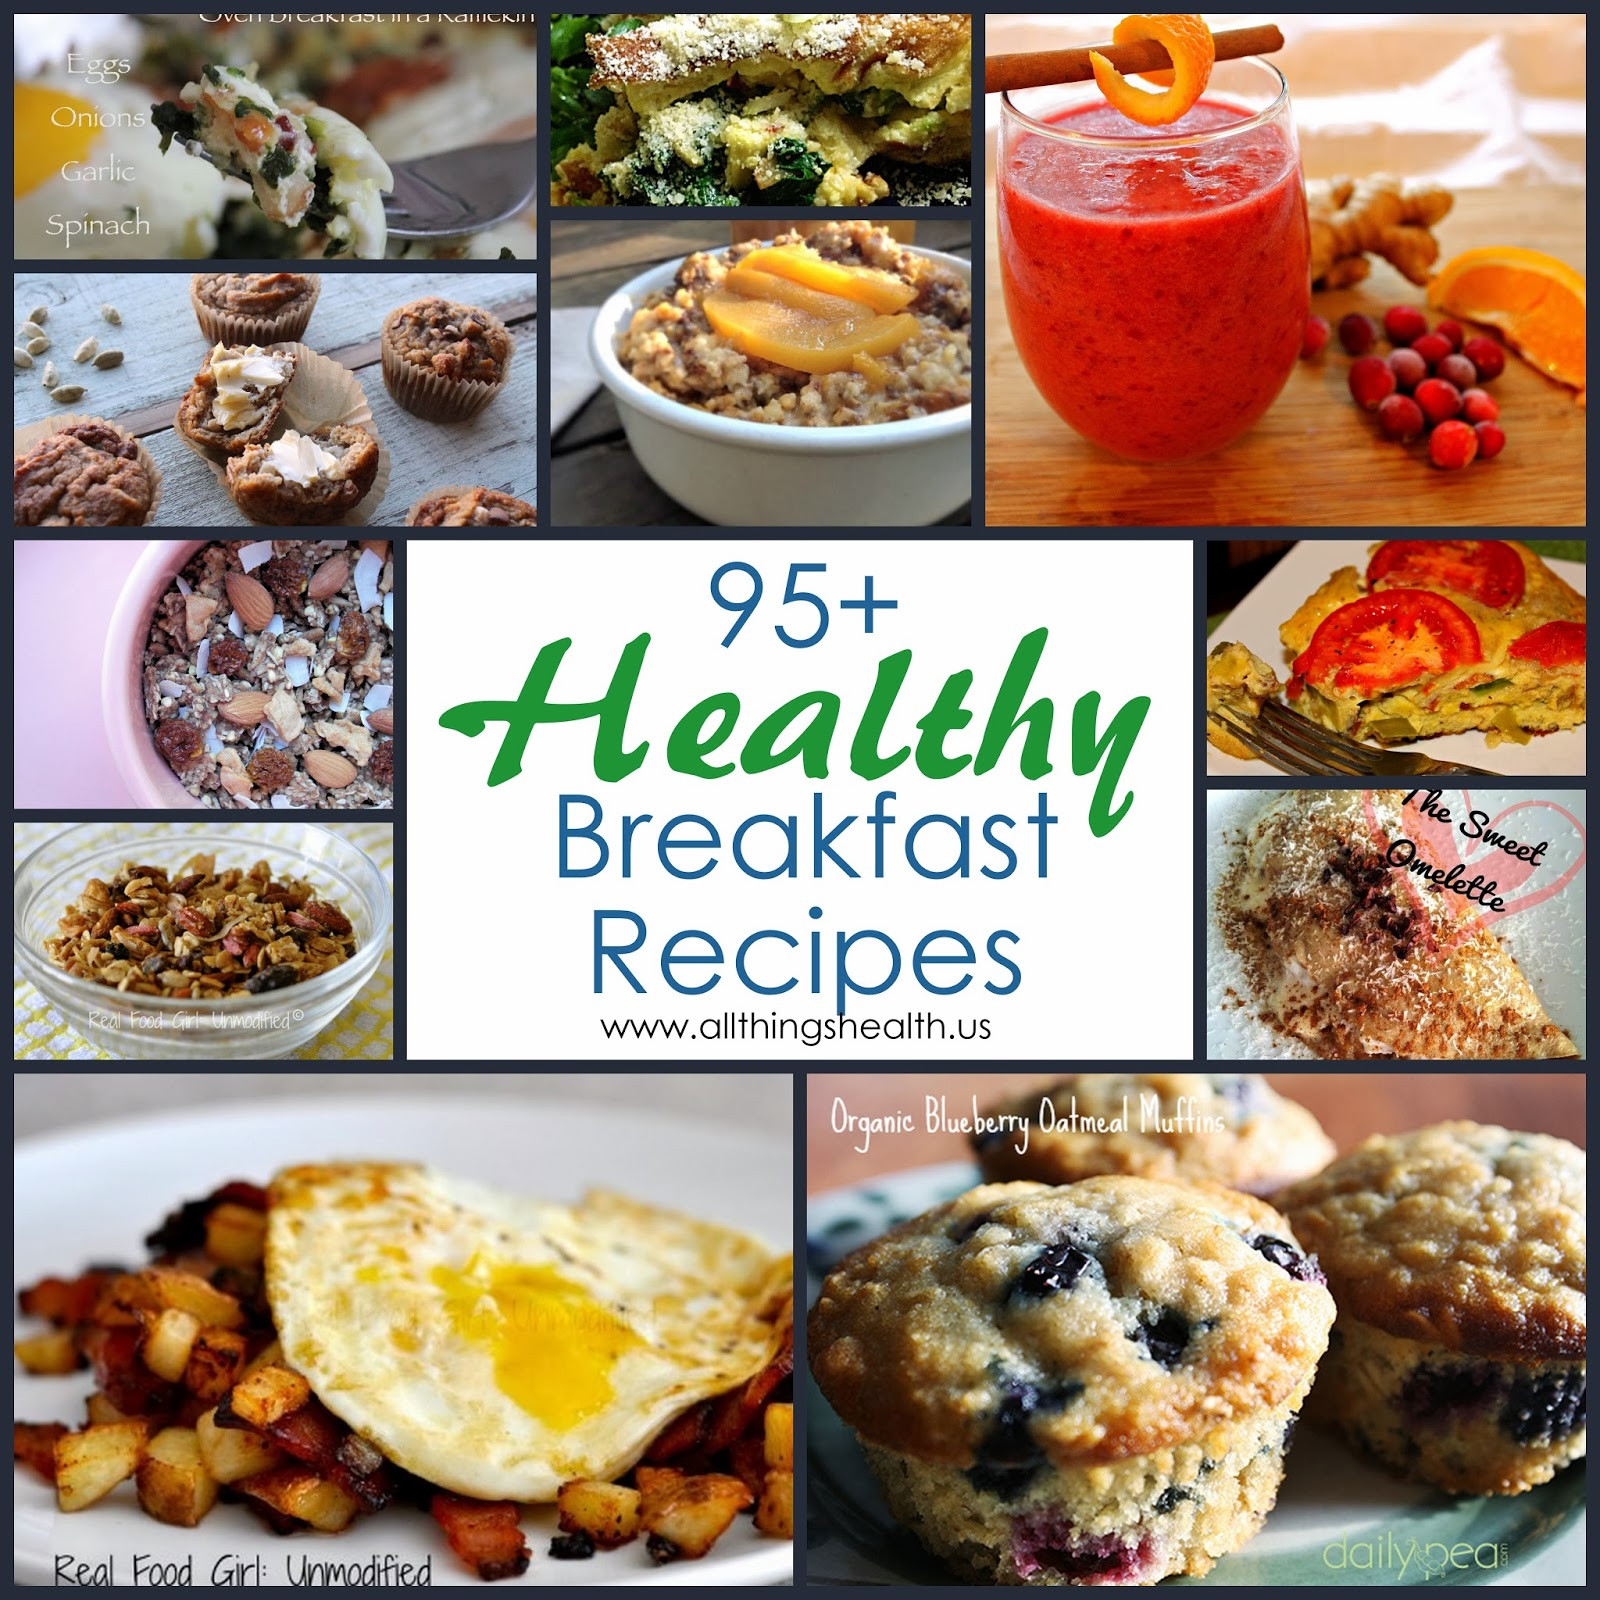 Healthy Breakfast Foods  All Things Health 95 Healthy Breakfast Recipes